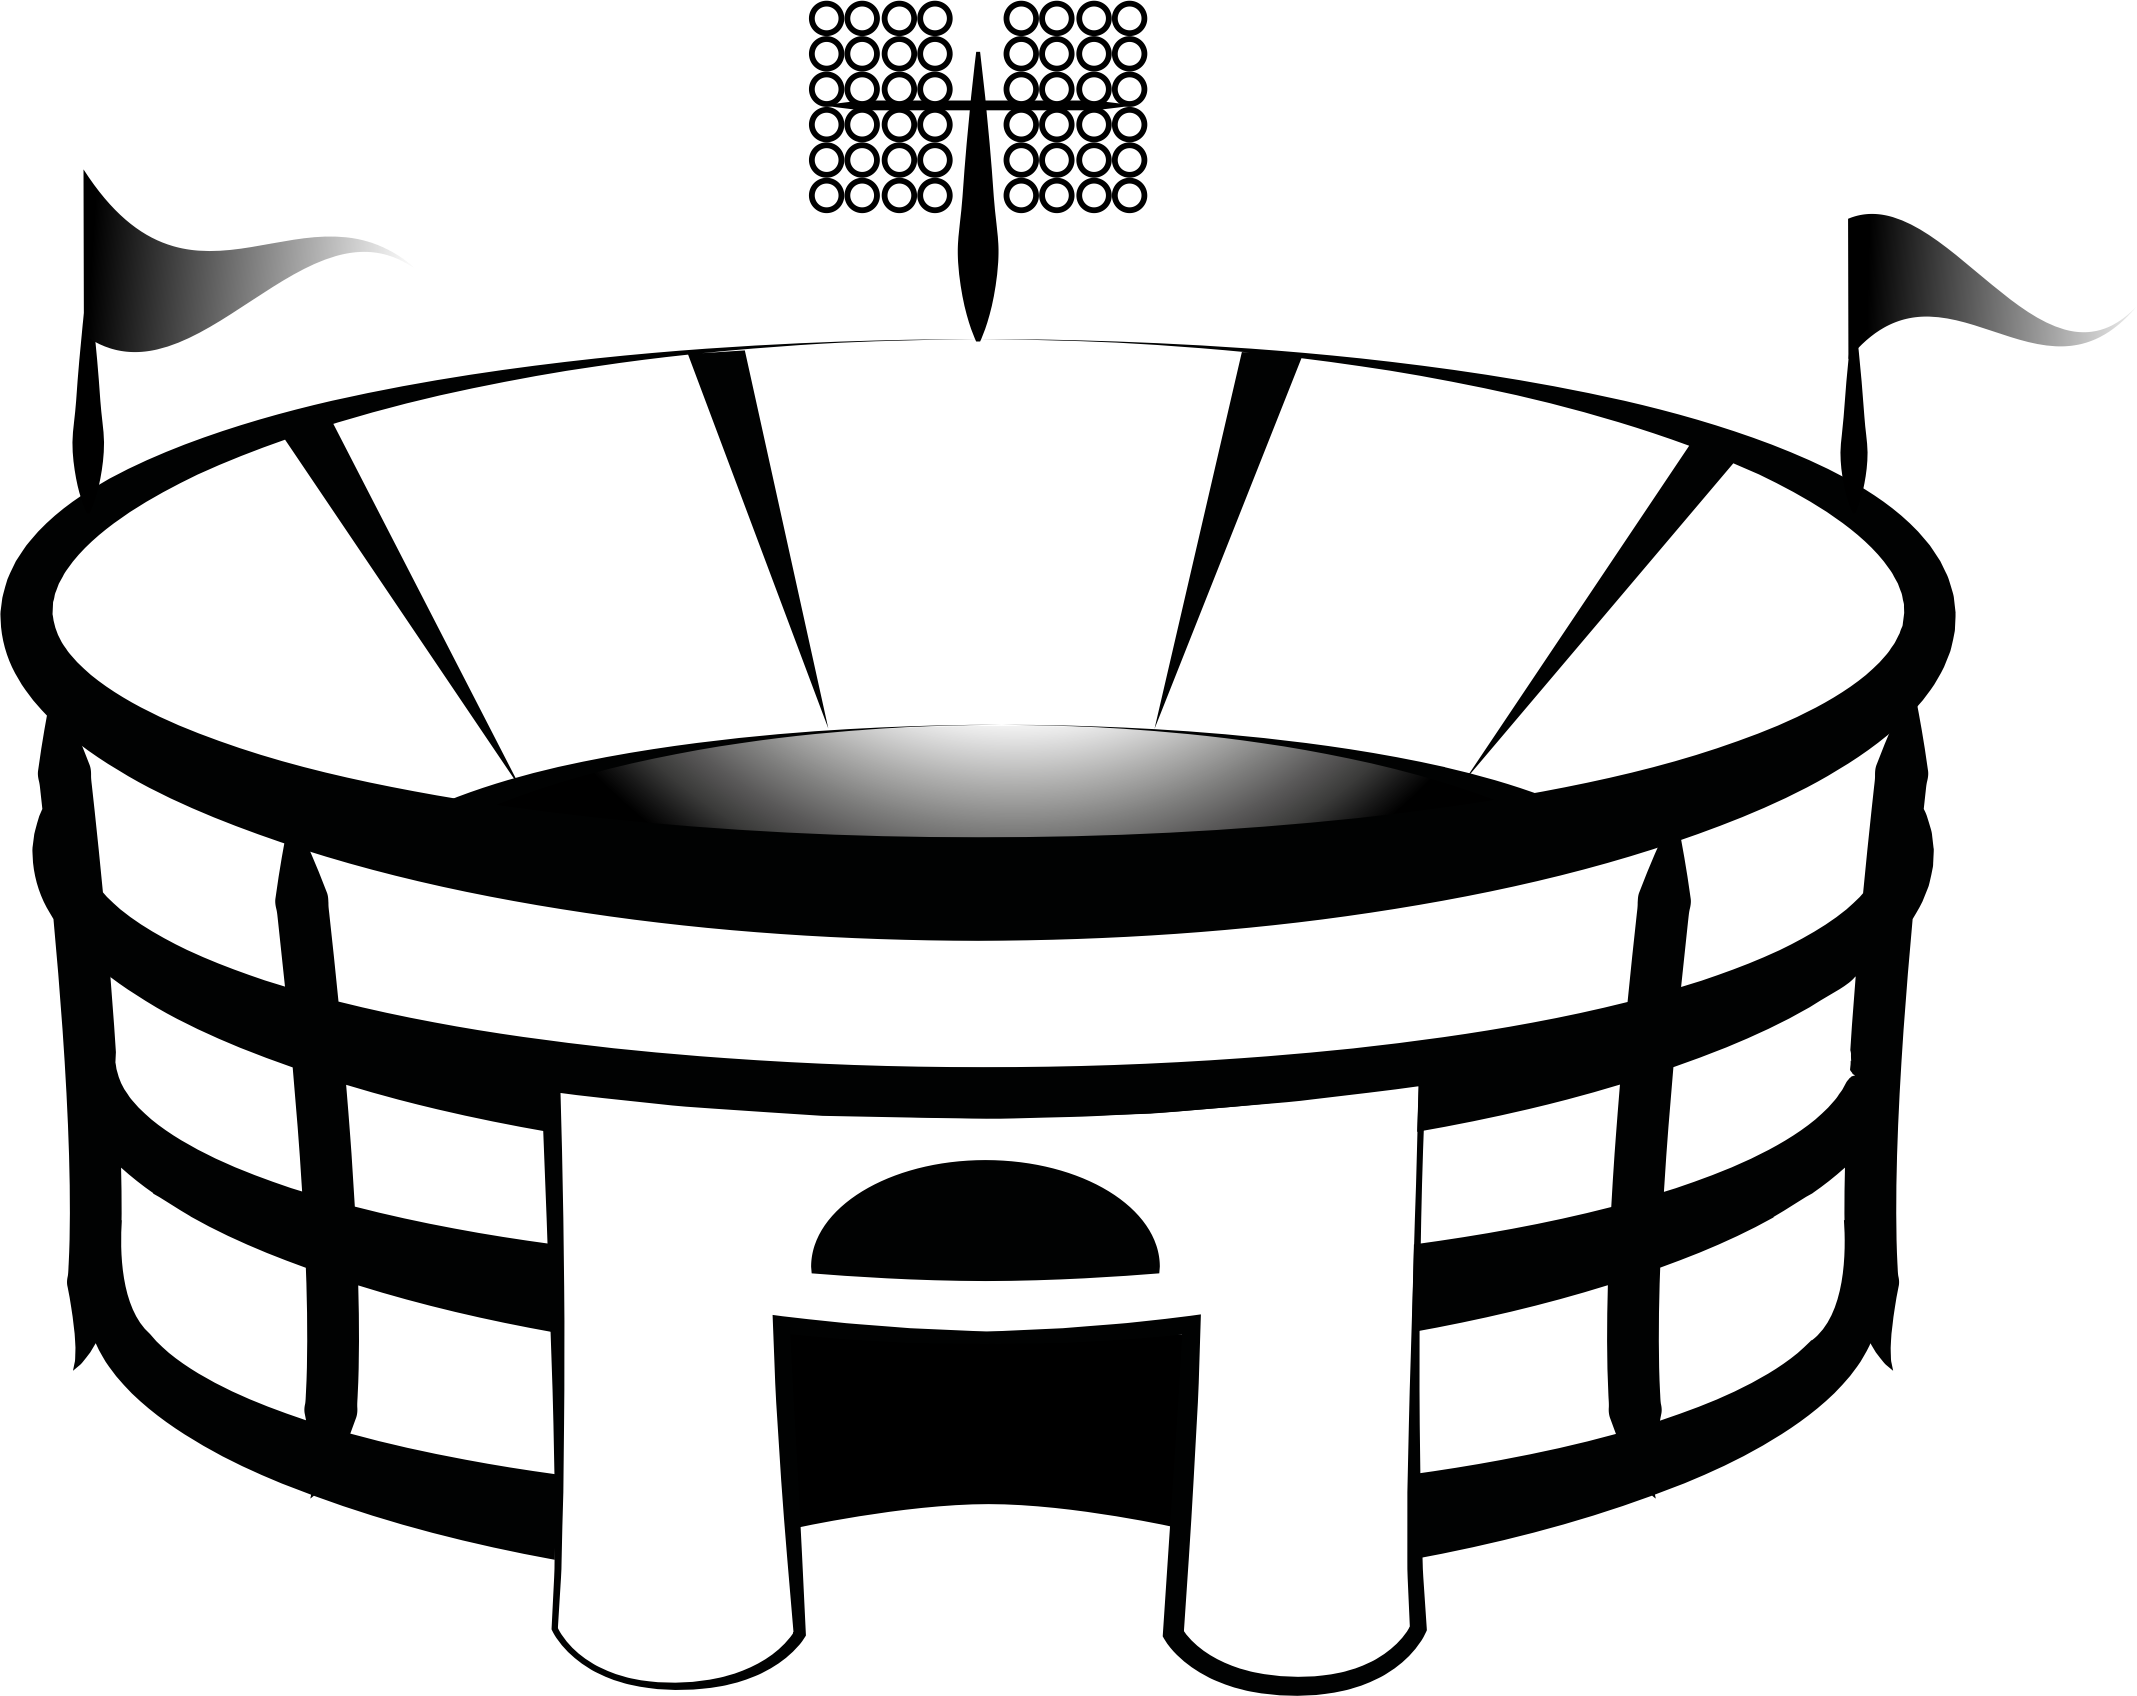 Arena panda free images. Lights clipart football